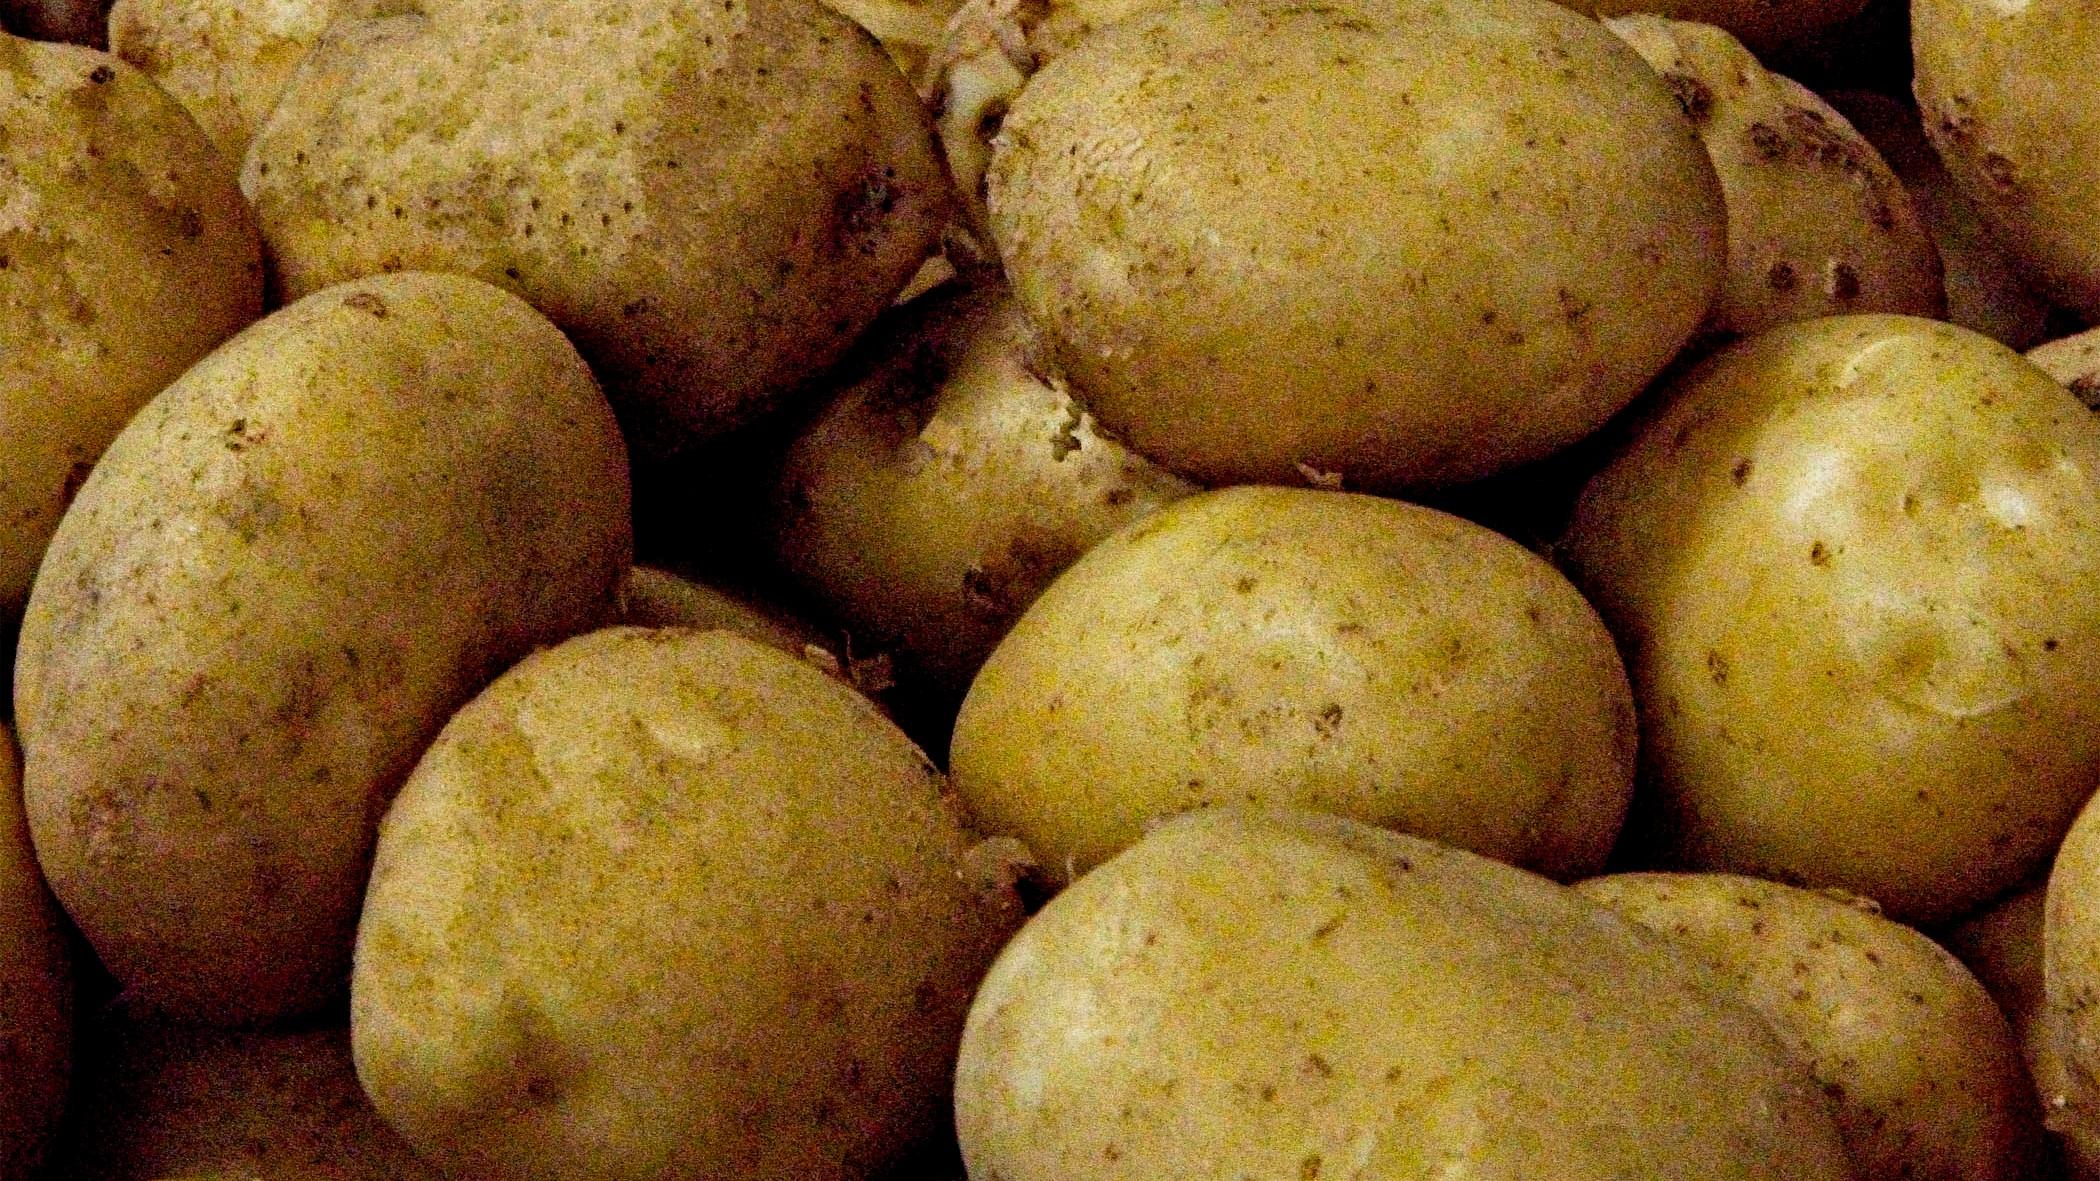 white potatoes -